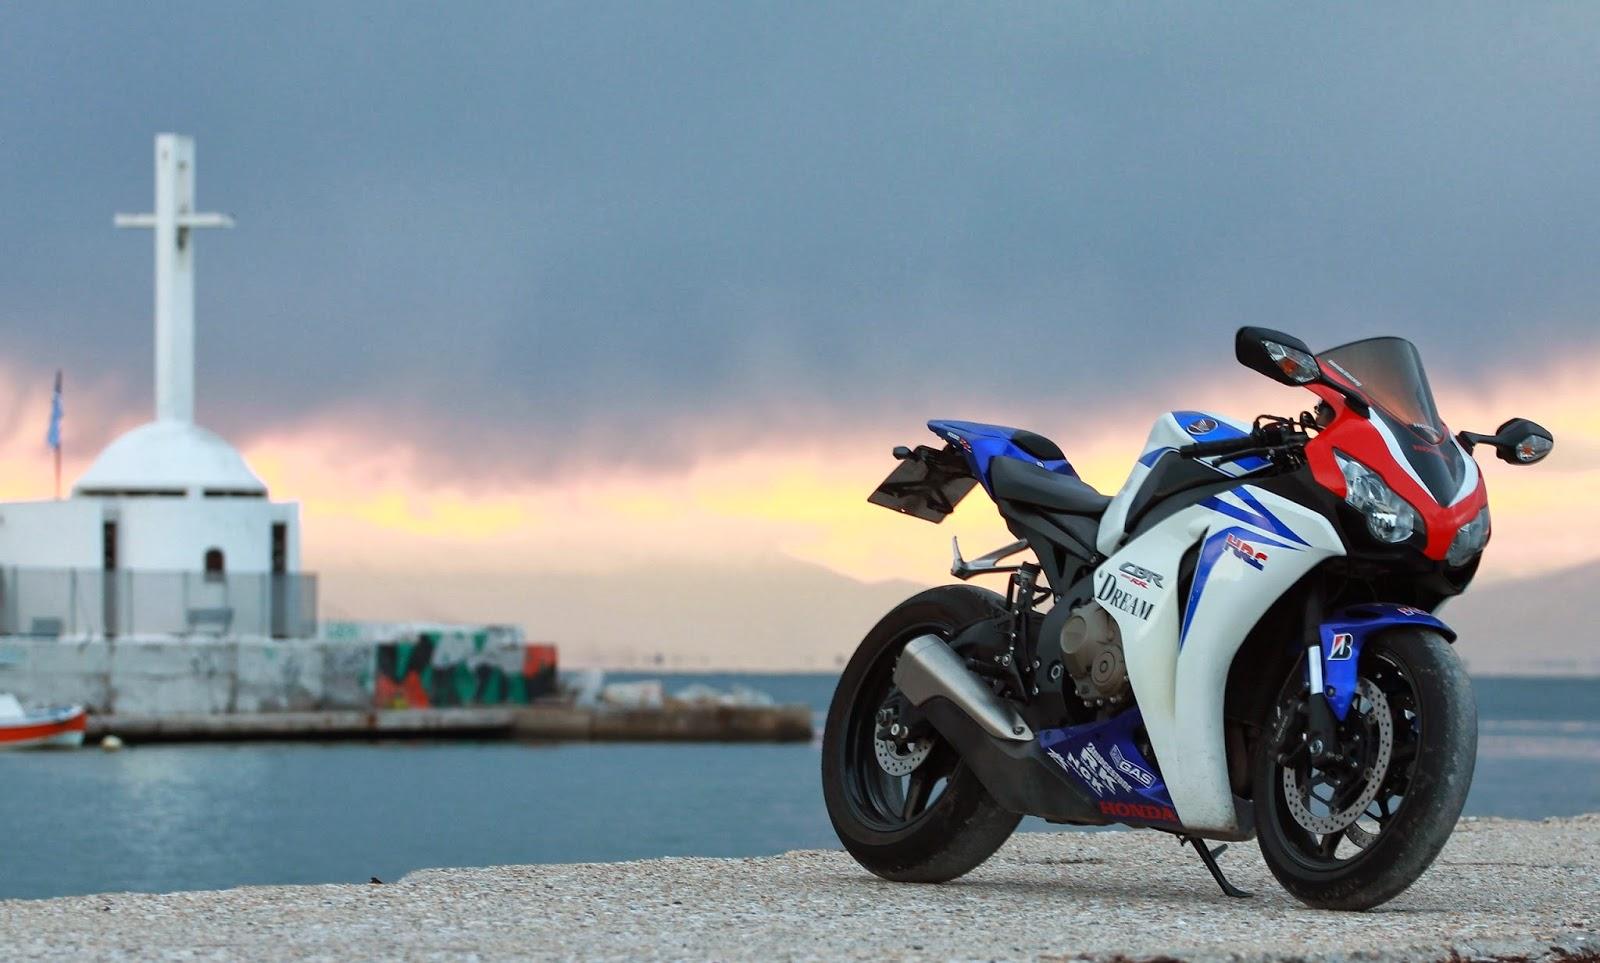 Bike & Cars HD Wallpapers Honda HRC 1000R Motorcycle HD